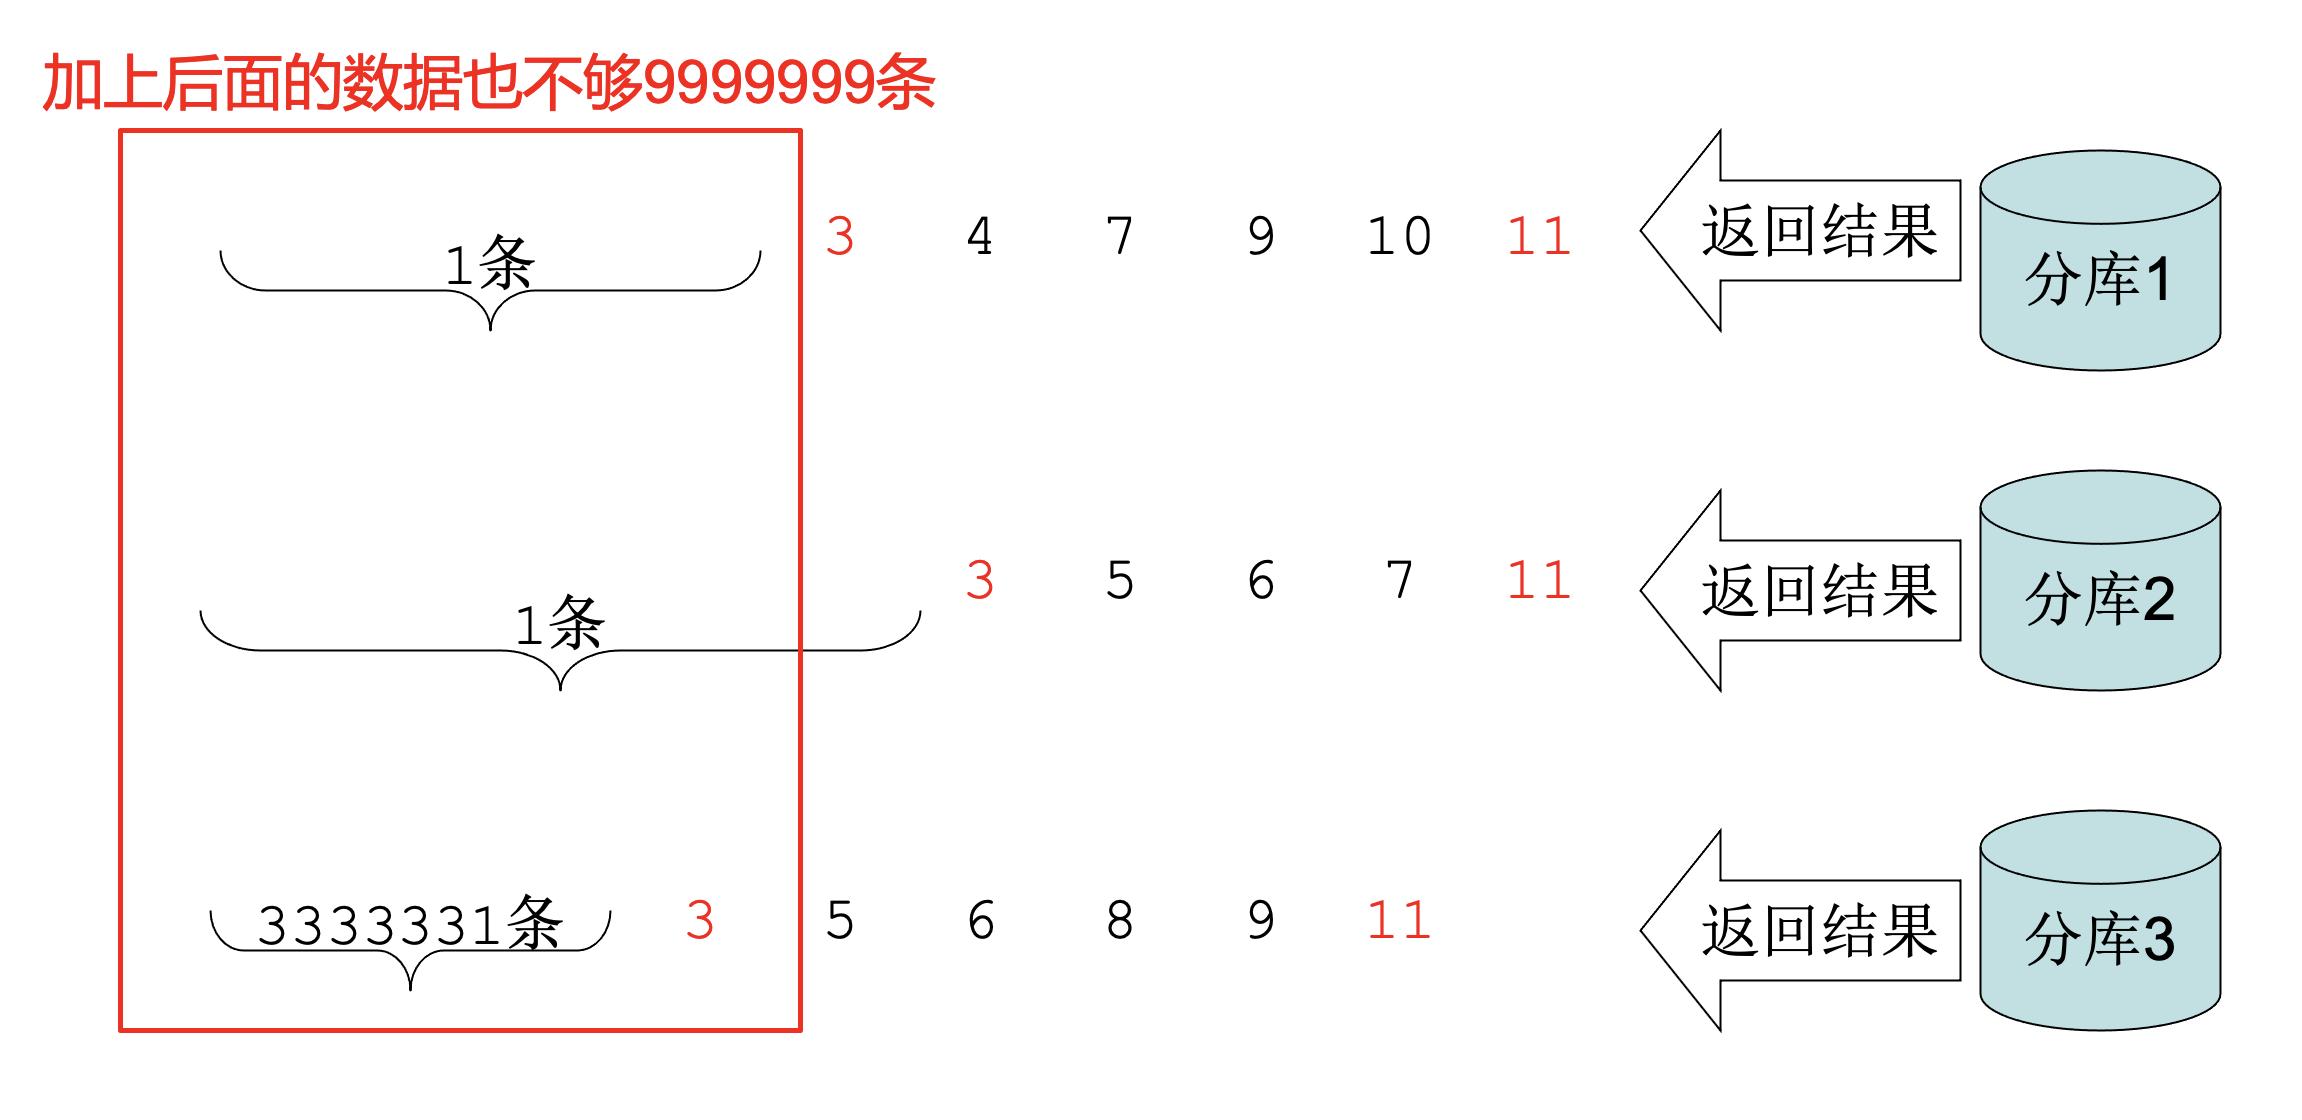 Cobar提出的一种在分库场景下对Order By / Limit 的优化